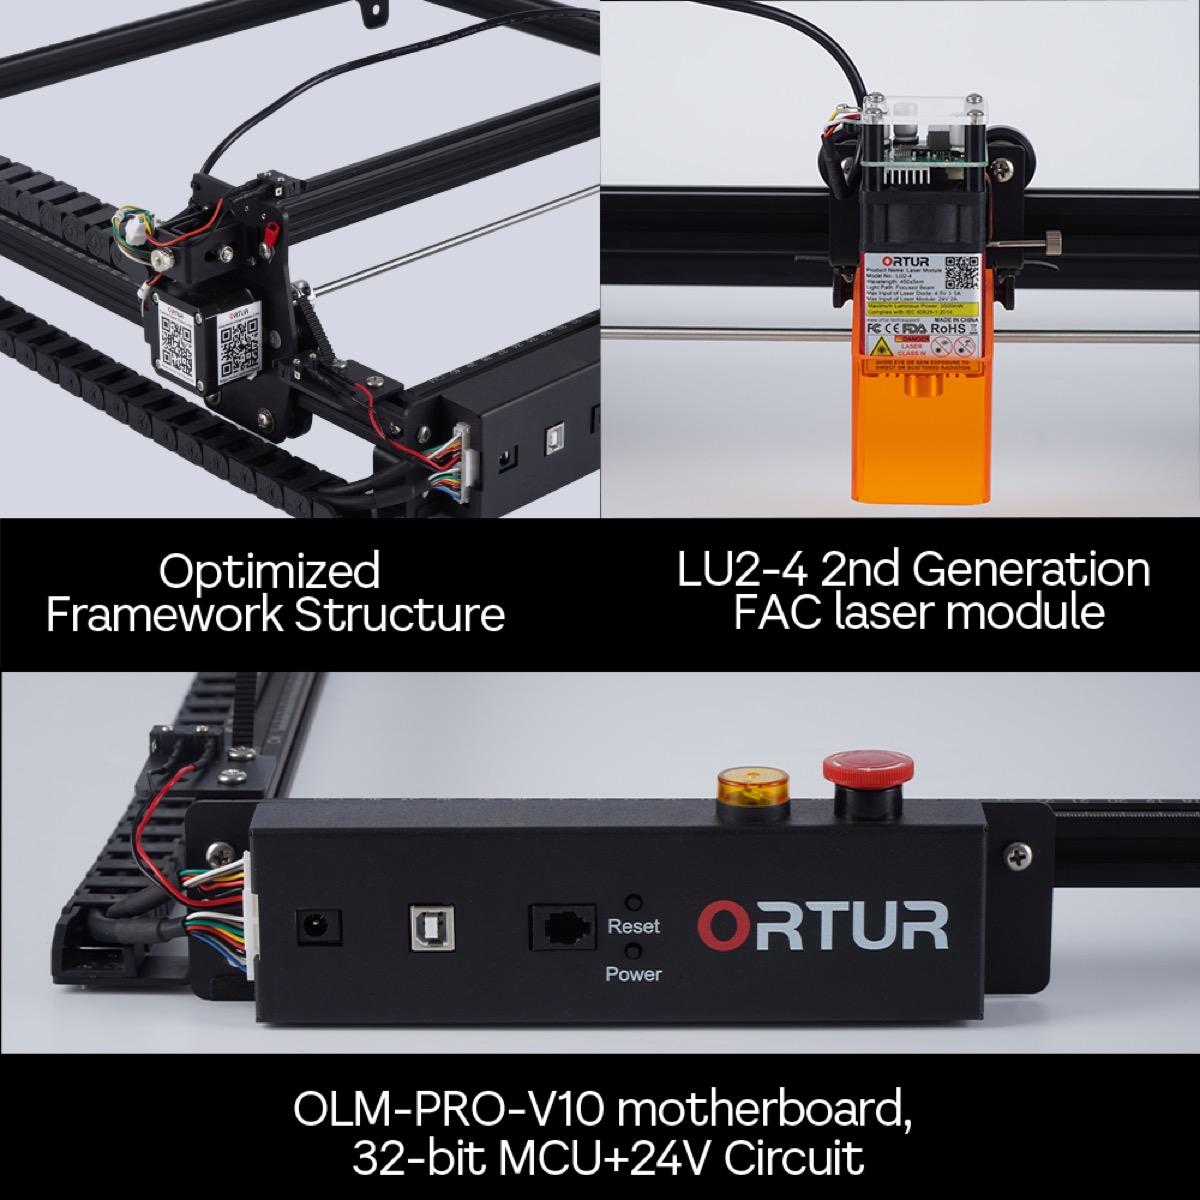 Incisore laser Ortur Laser Master 2 Pro: offerta bomba